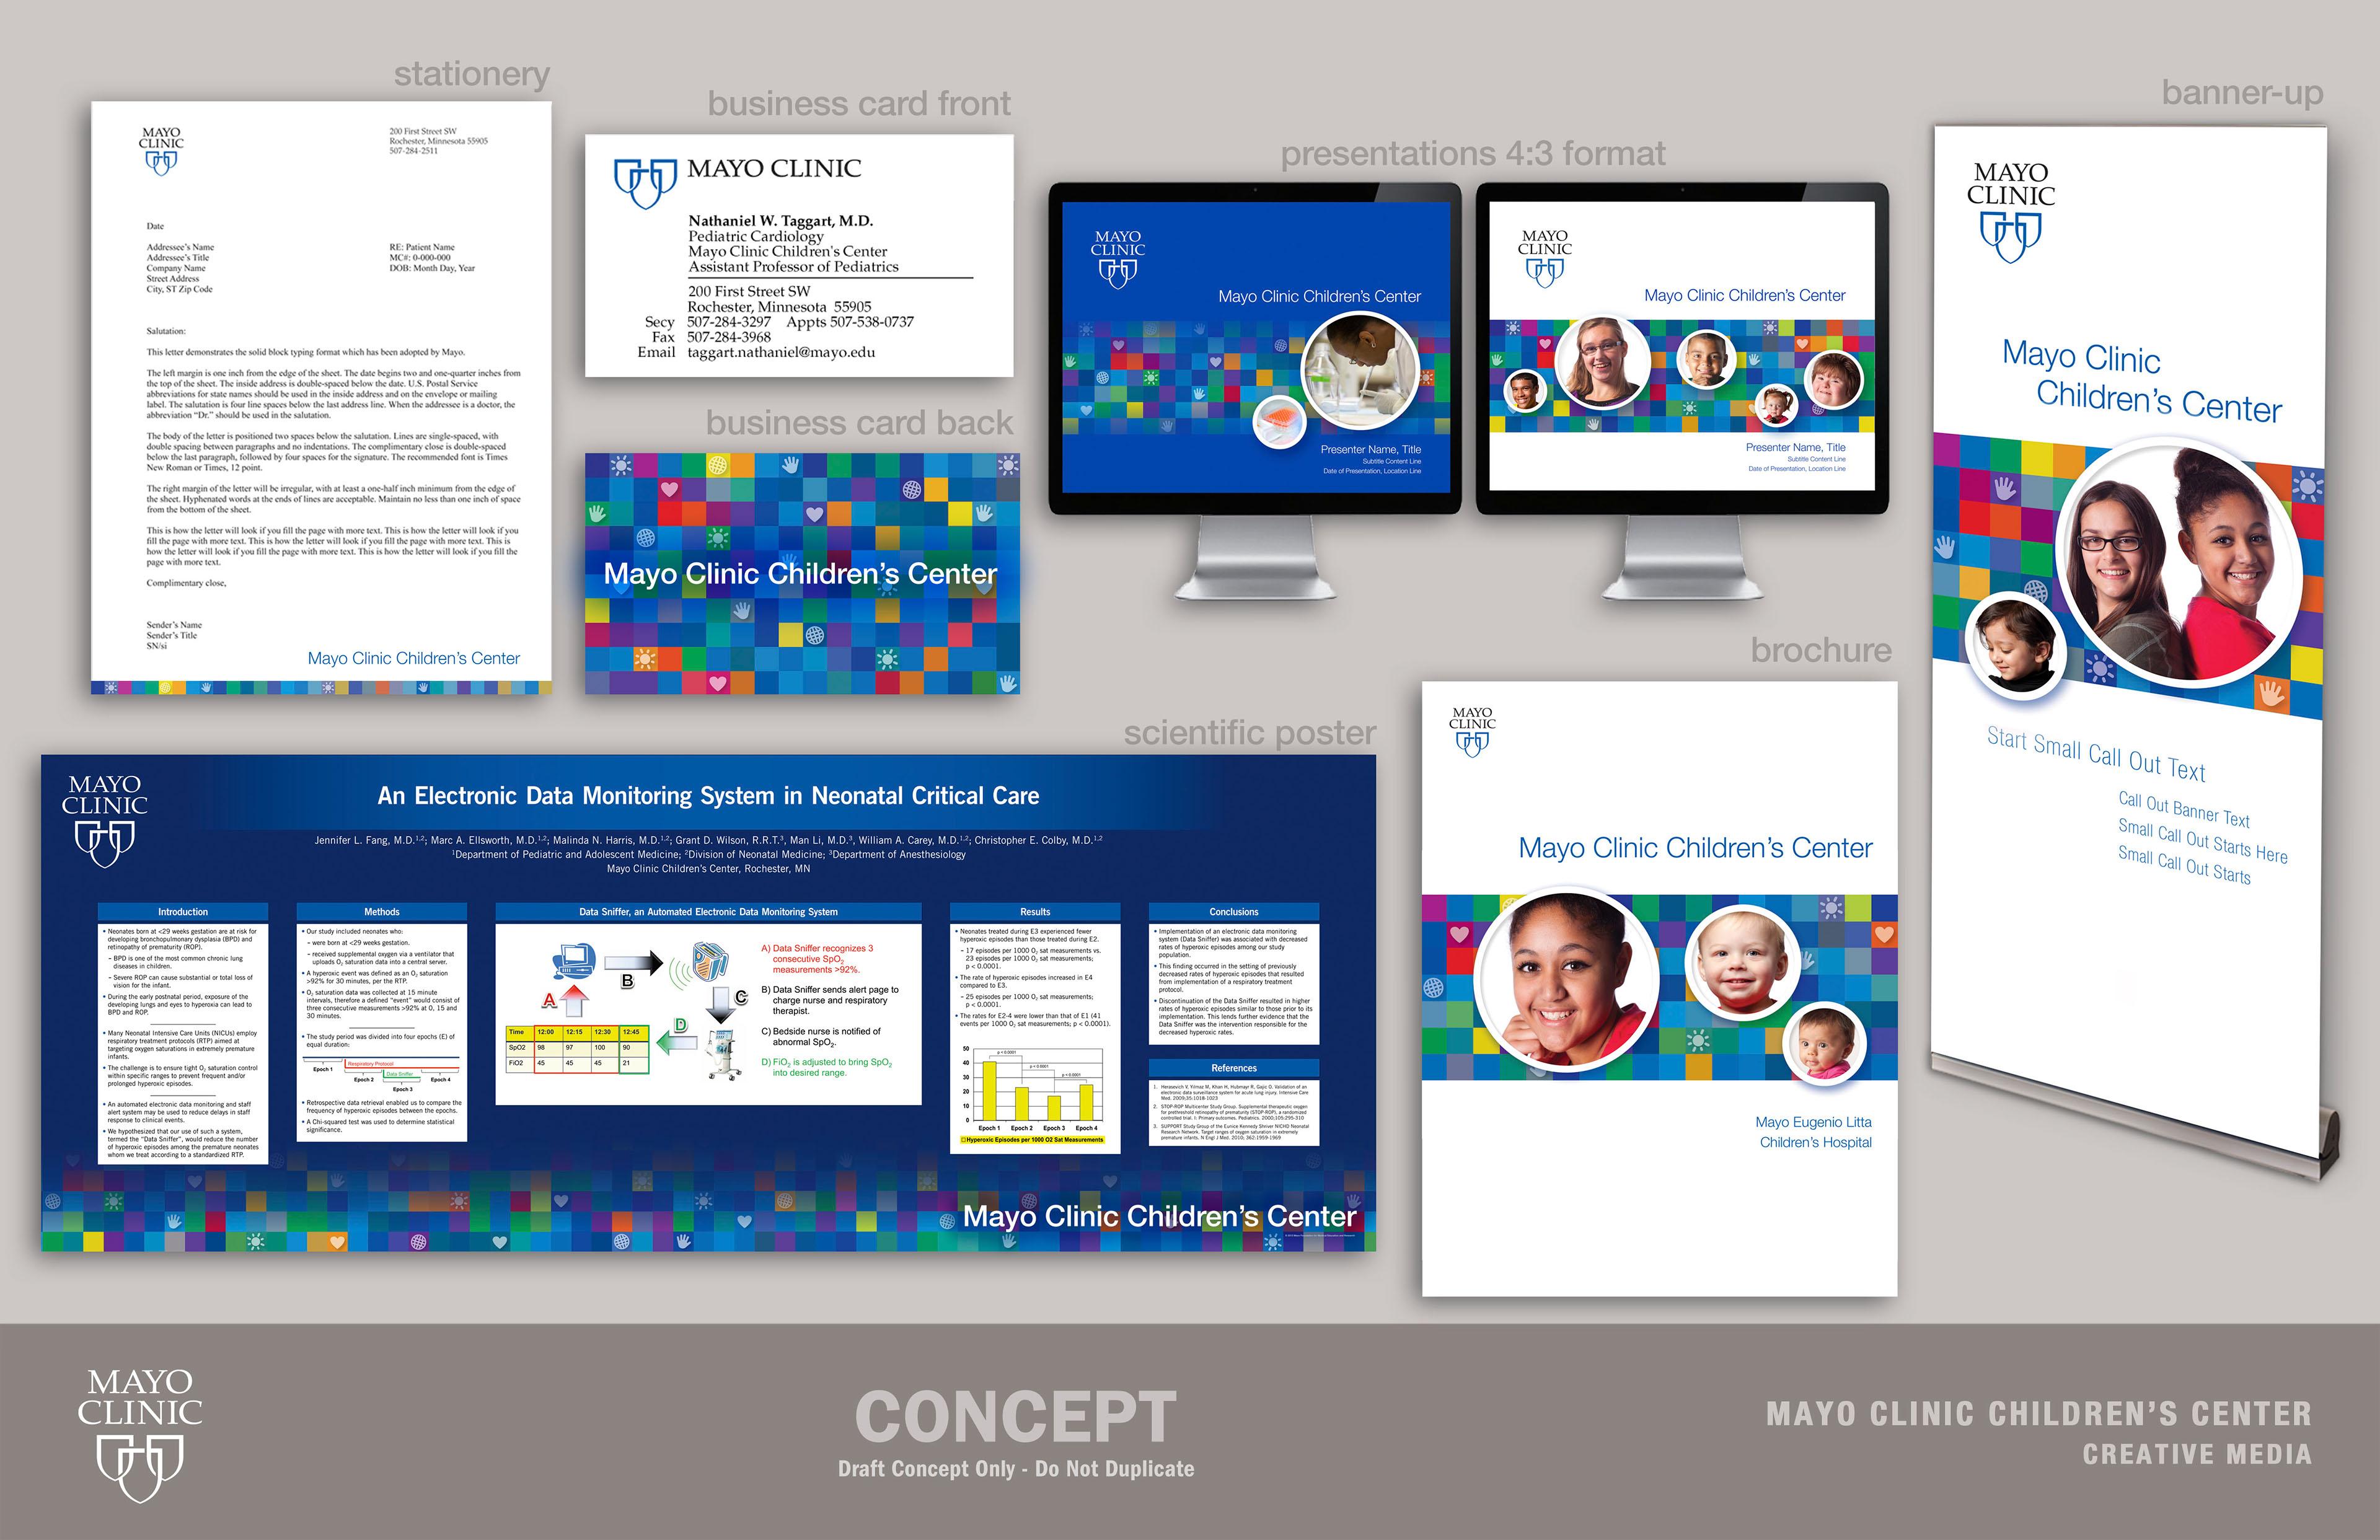 Abby Bradford - Mayo Clinic Children's Center Concepts